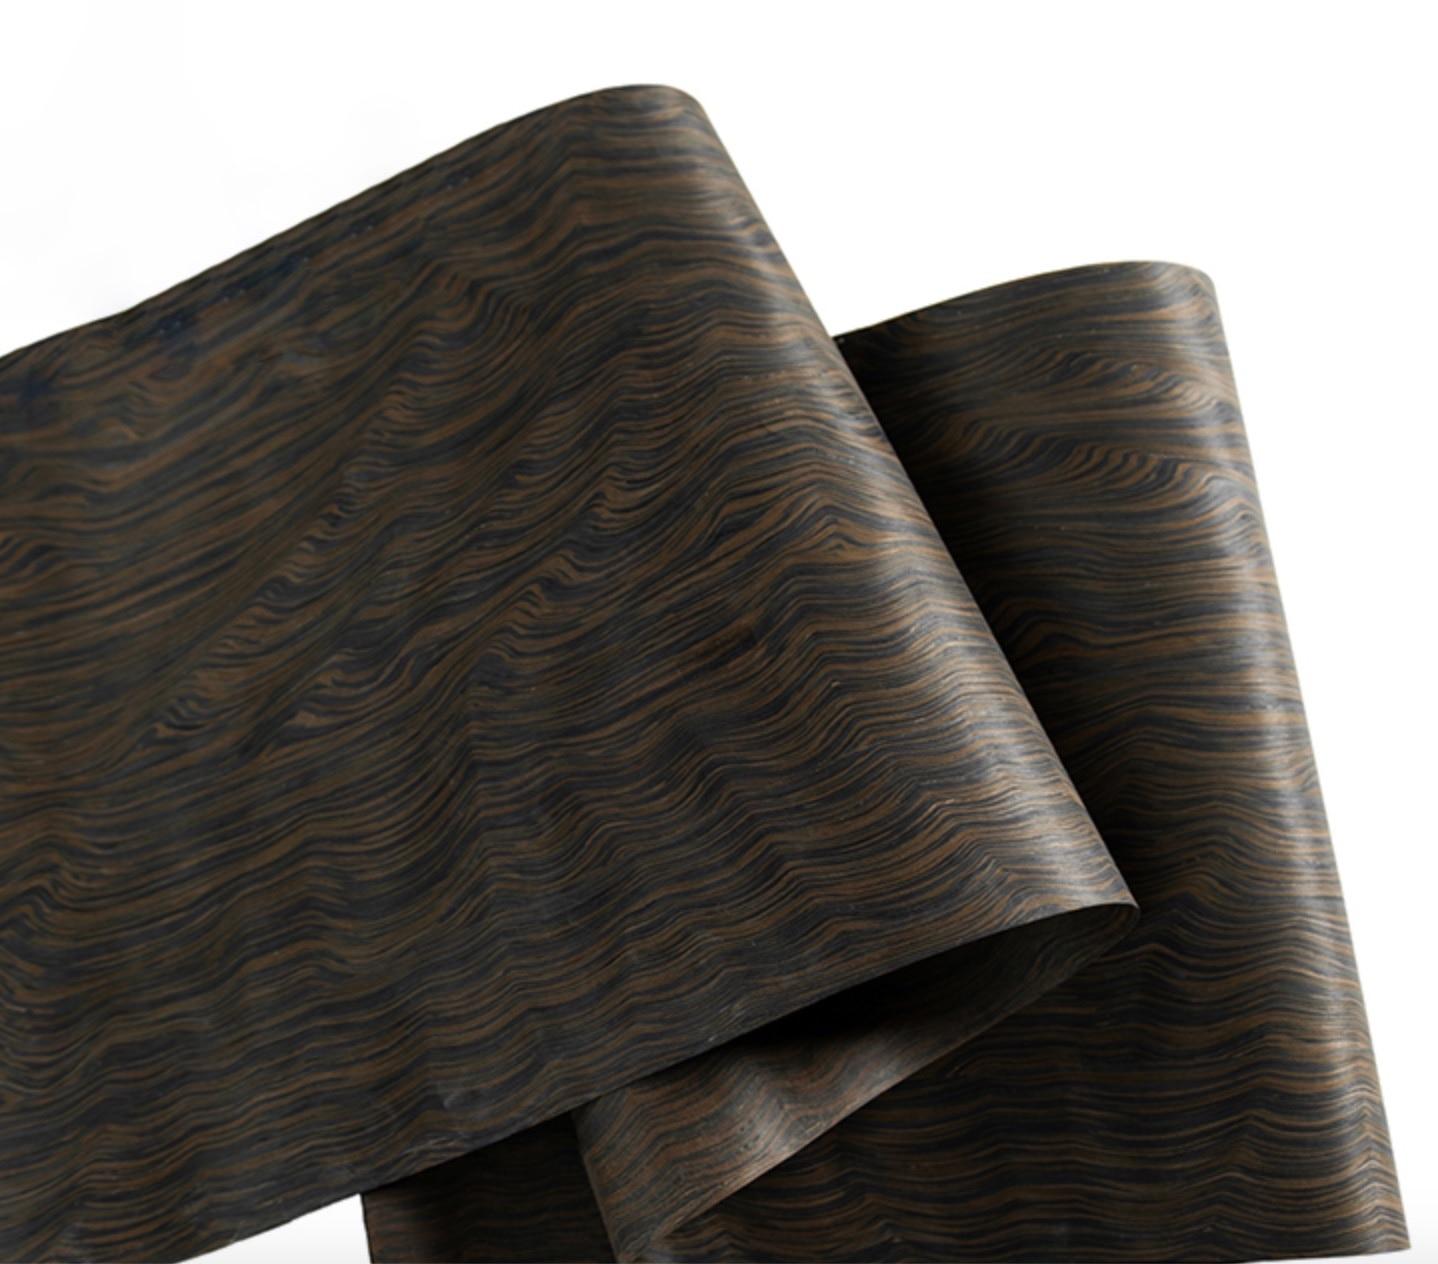 L:2.5 متر عرض: 60 سنتيمتر سمك: 0.2 مللي متر تكنولوجيا خشب الأبنوس جذر اللحاء (ظهر قماش غير منسوج)